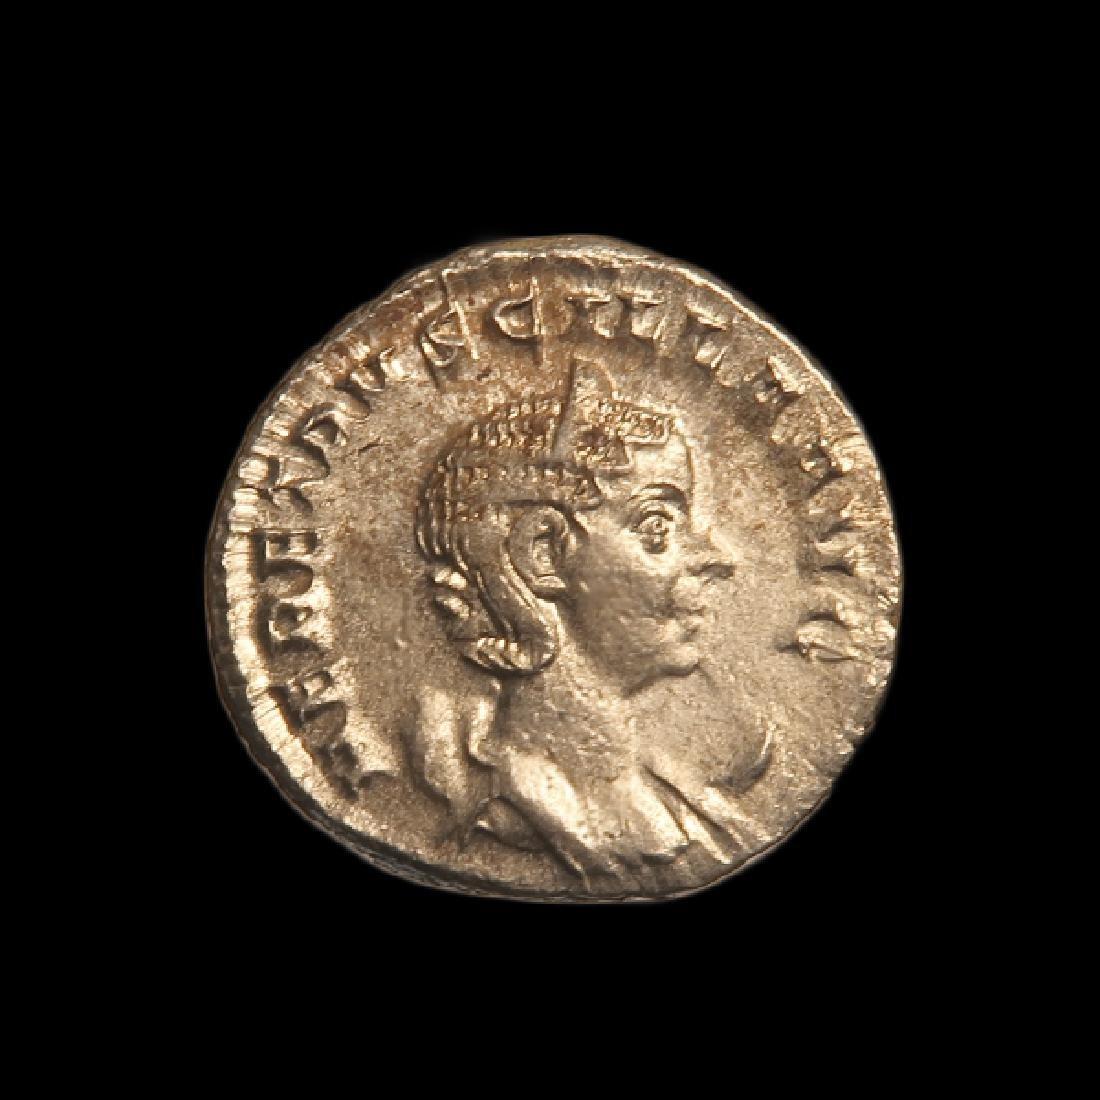 Roman Silver Coin, Etruscilla, Wife of Emperor Trajan,